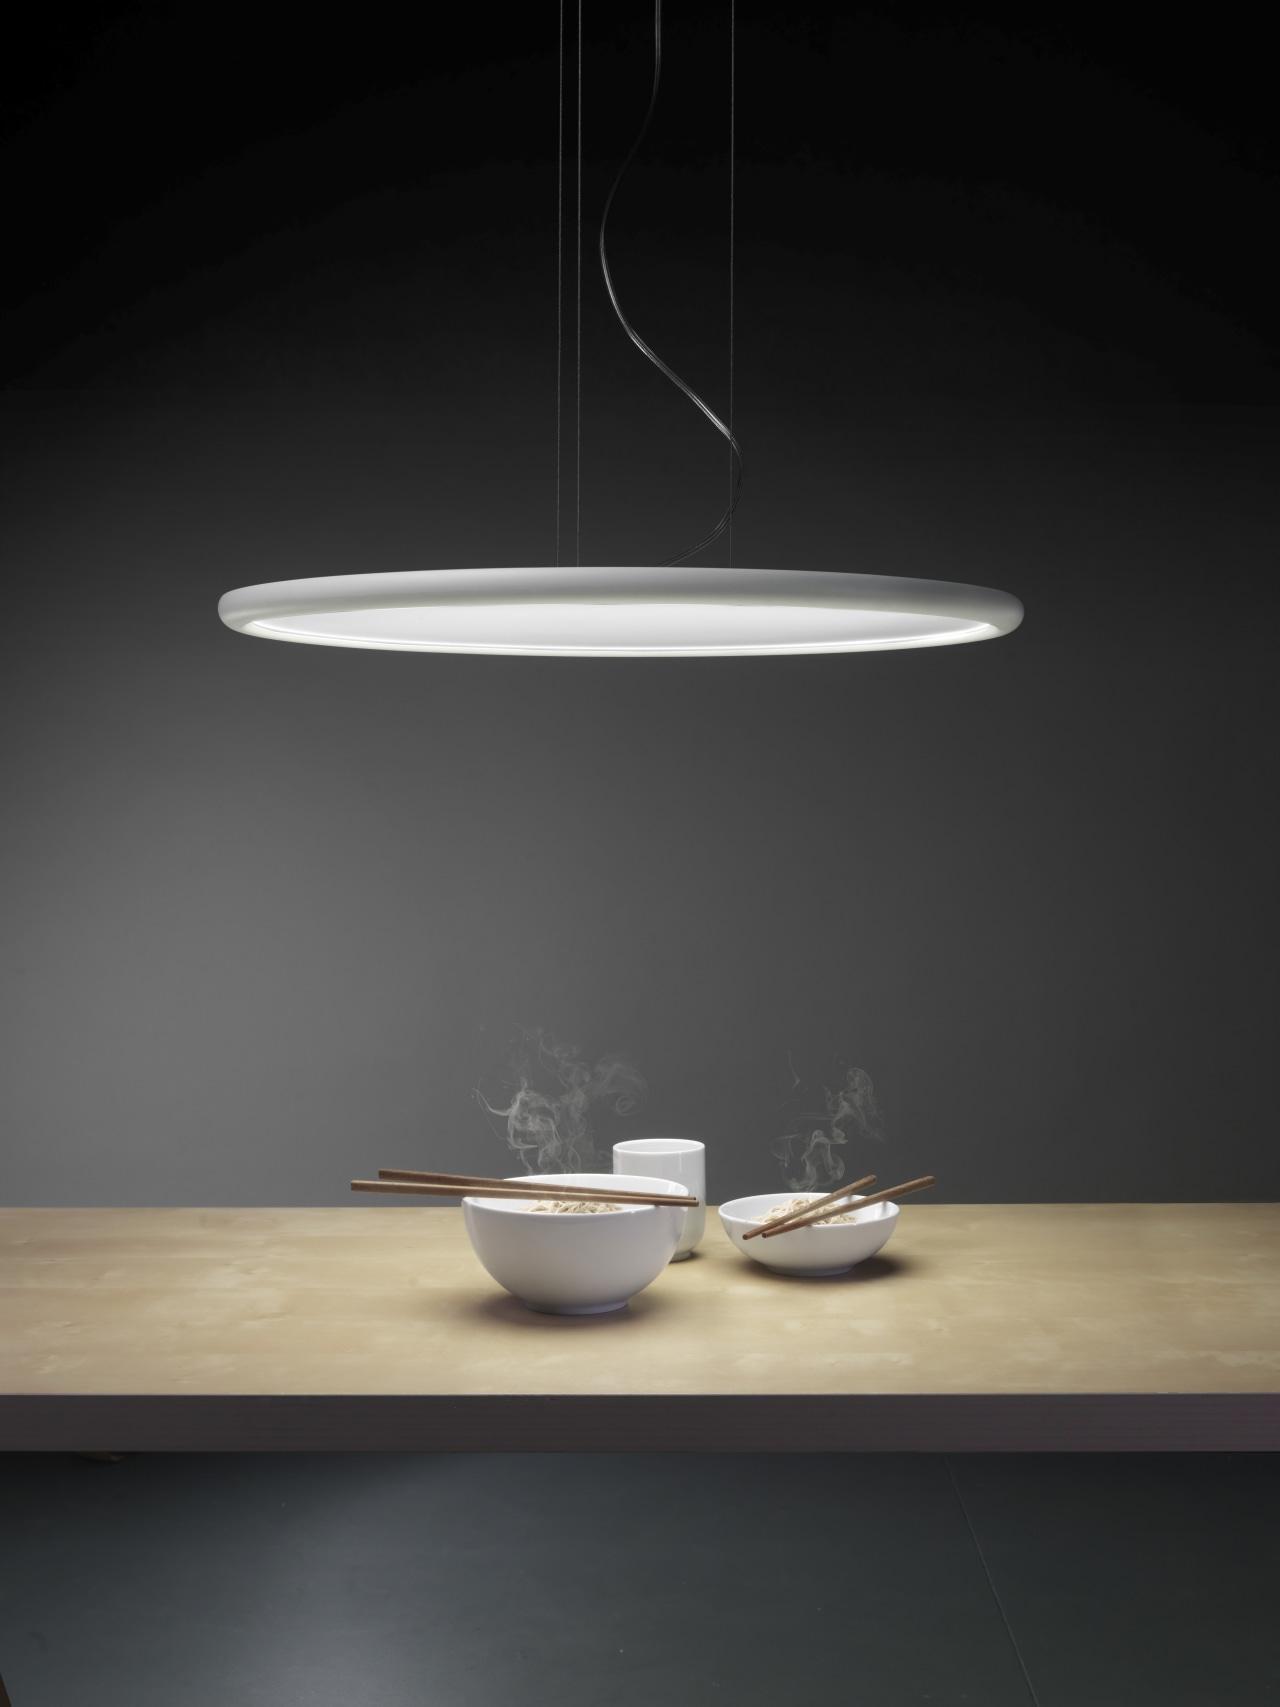 LED lighting solutions that provide good task lighting ceiling fixture, lamp, light, light fixture, lighting, lighting accessory, product design, still life photography, table, black